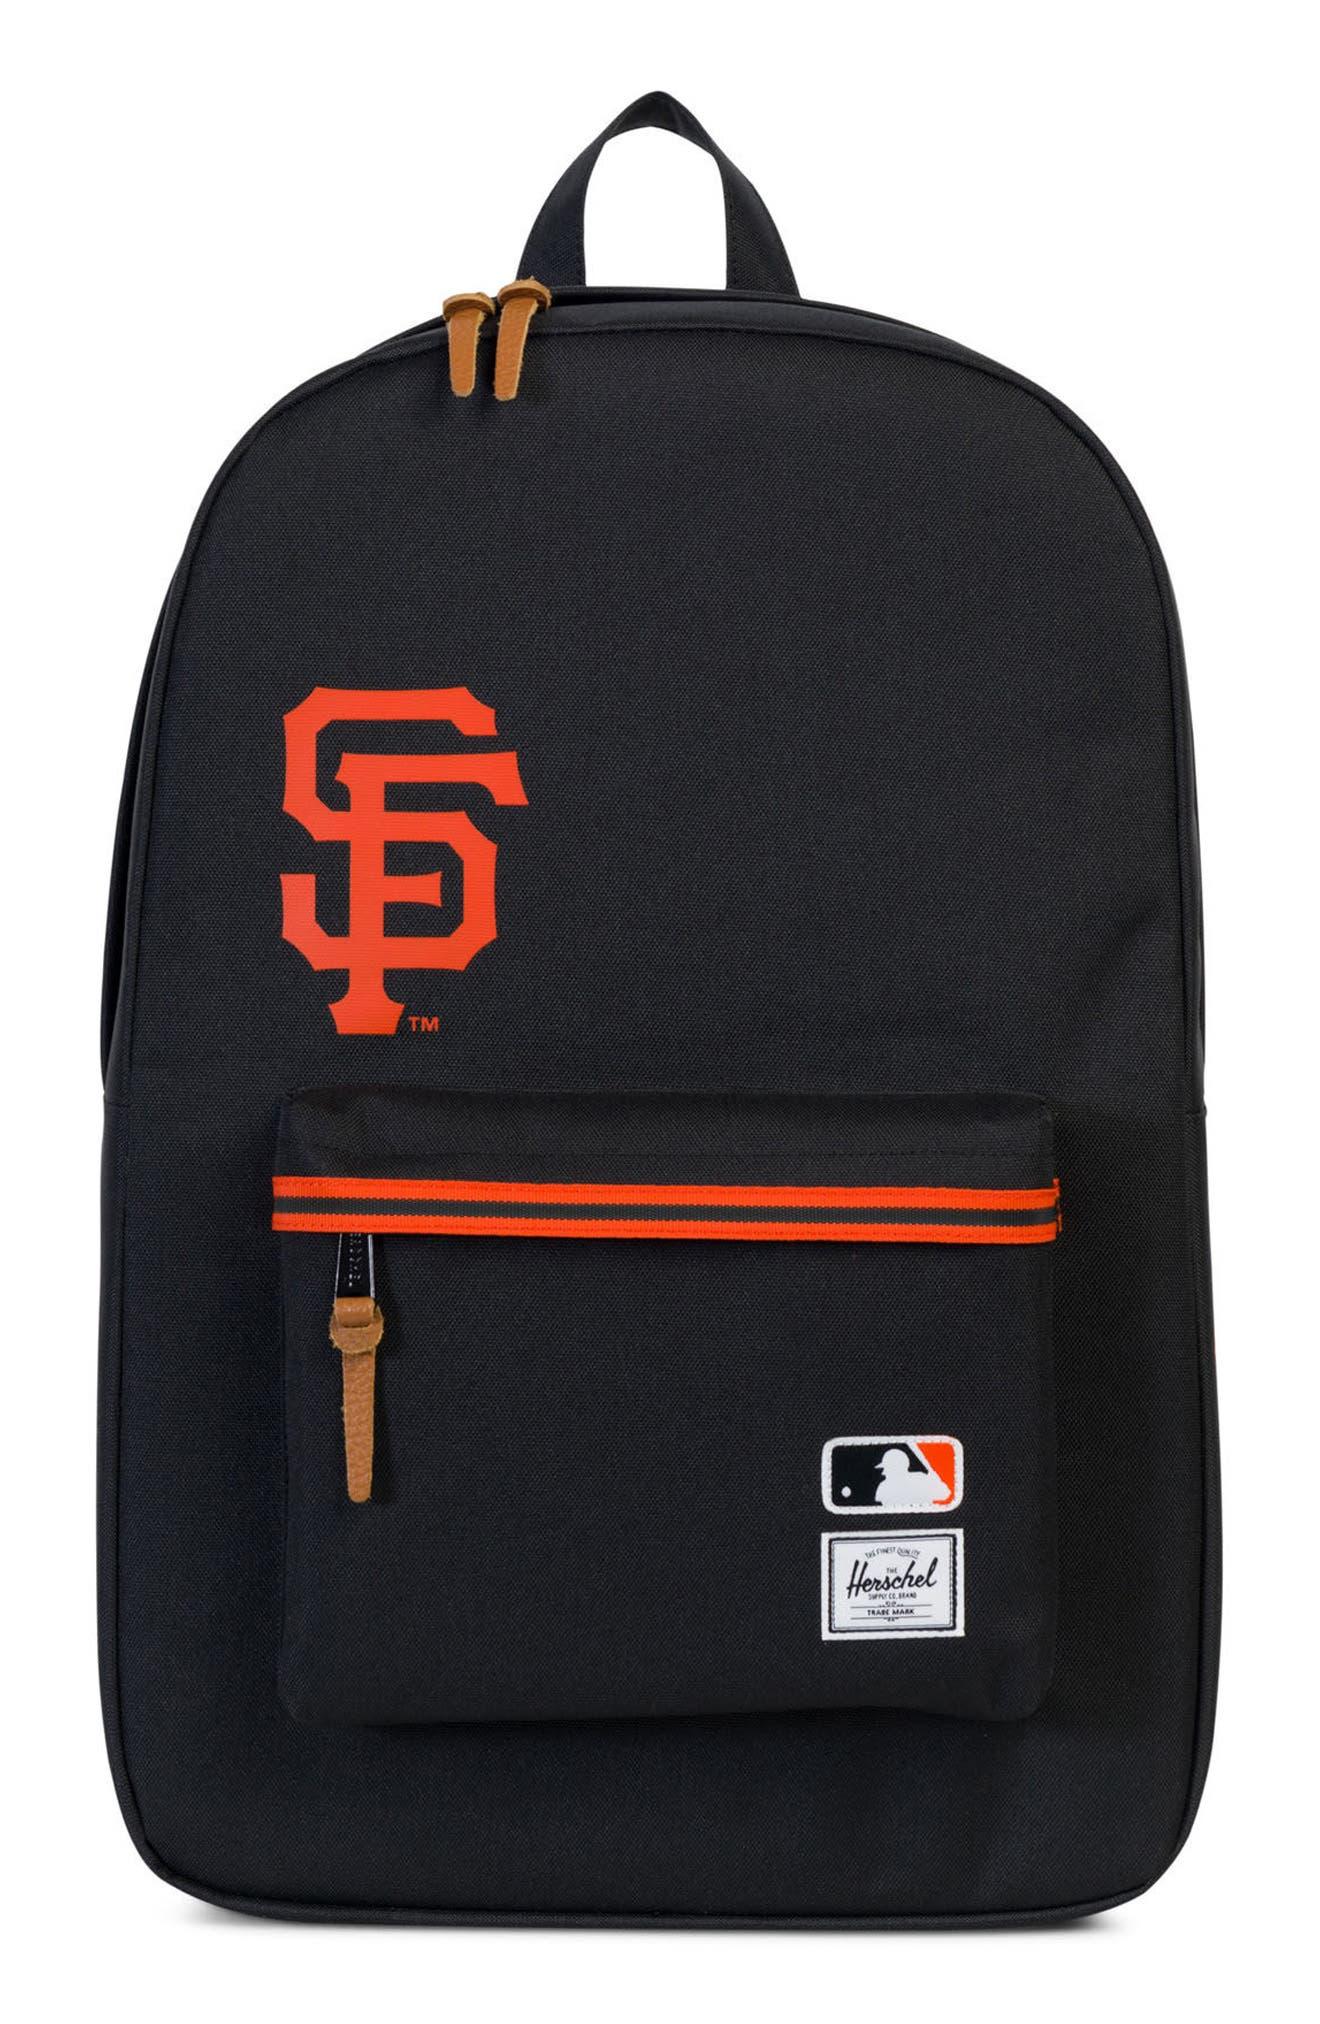 Heritage San Francisco Giants Backpack,                             Main thumbnail 1, color,                             008